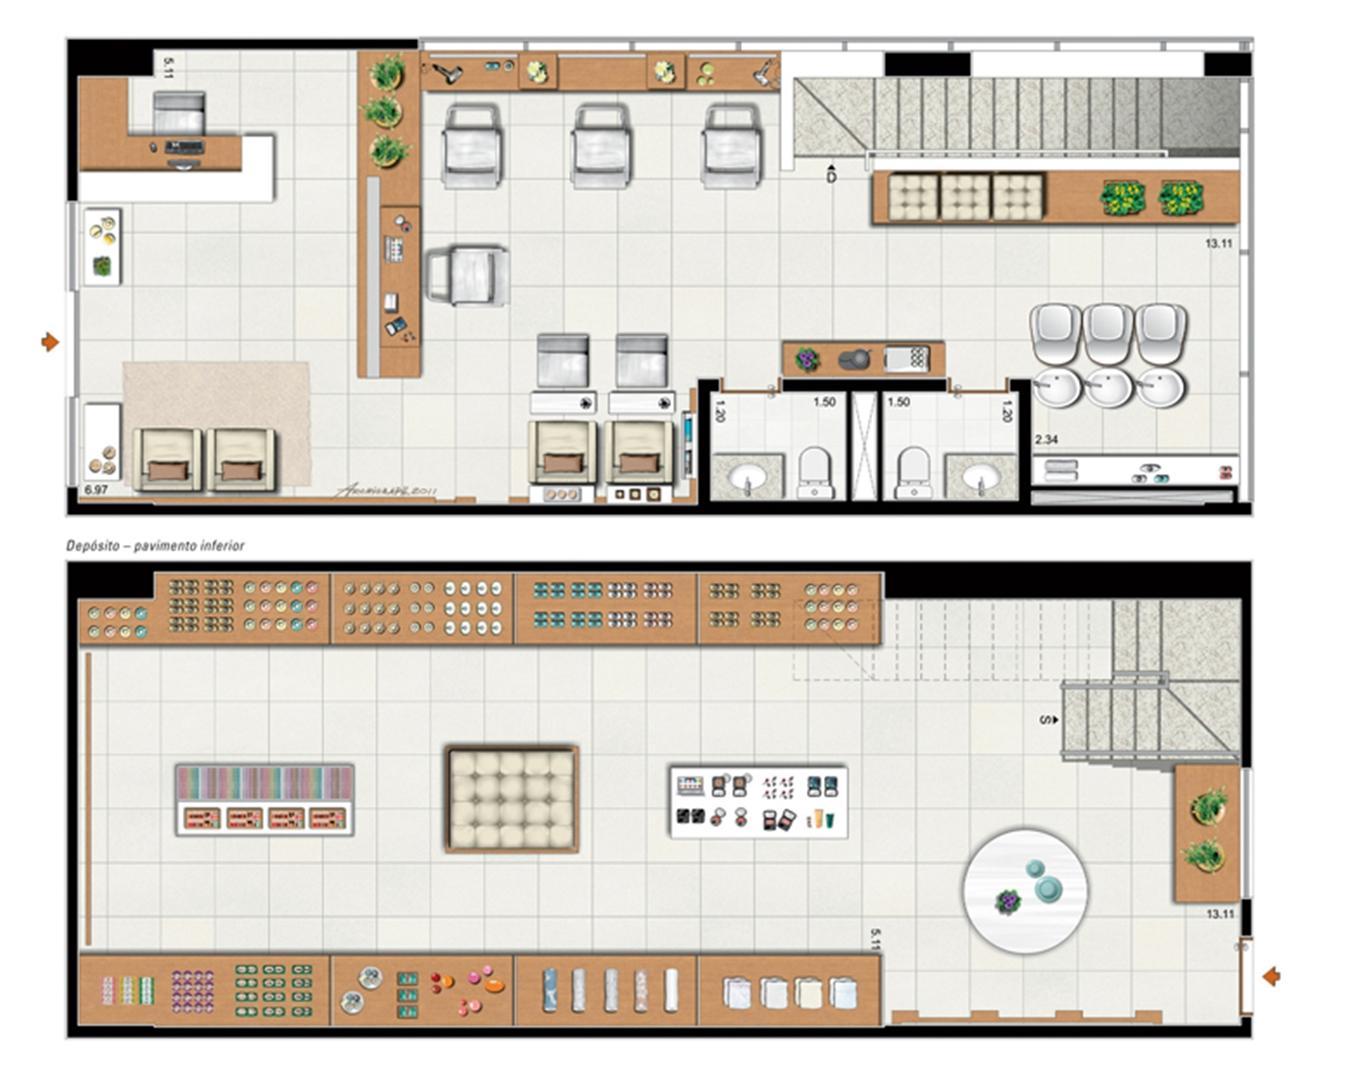 Planta de 104 m² privativos duplex   Vega – Salas Comerciais na  Asa Norte  - Brasília - Distrito Federal